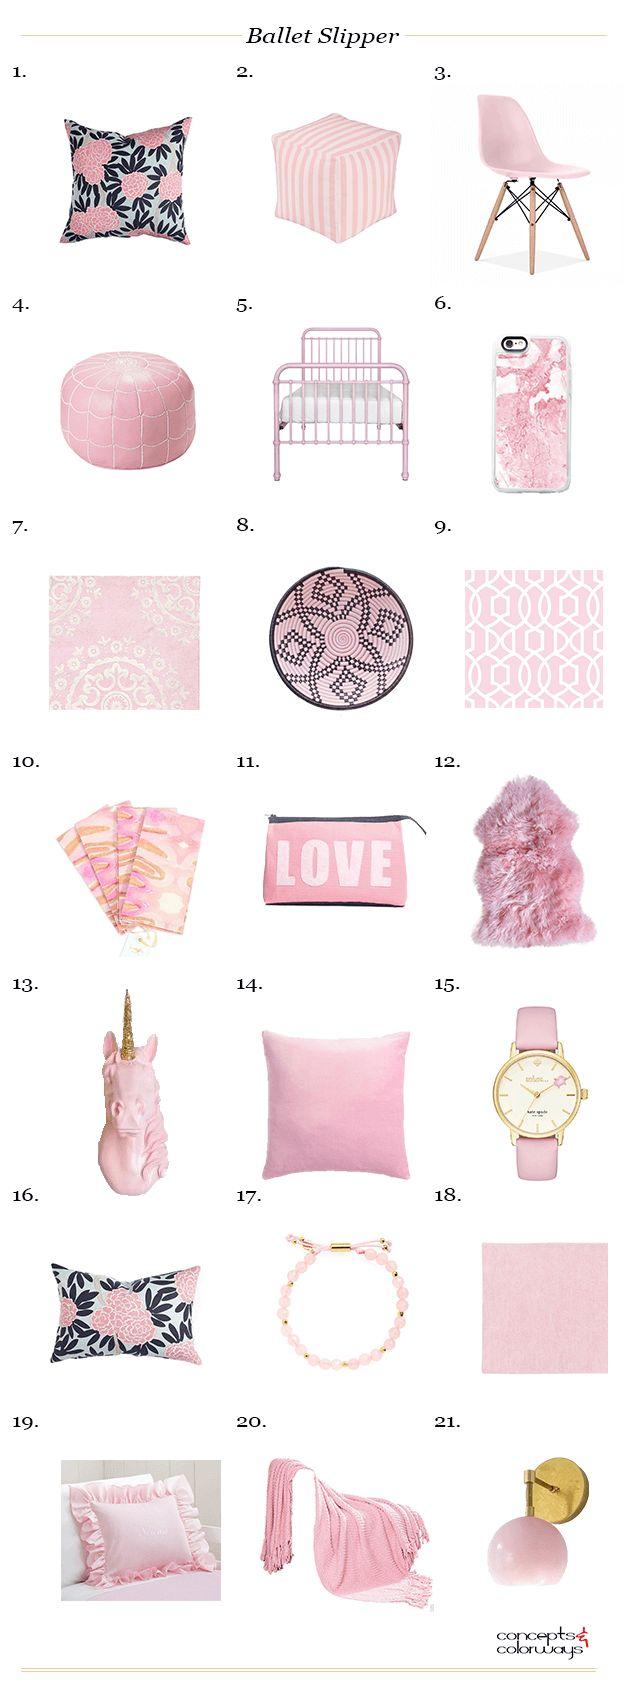 pantone ballet slipper, interior design product roundup, get the look, blush pink furniture, blush pink decor, pink interior design, color trends, 2017 color trends